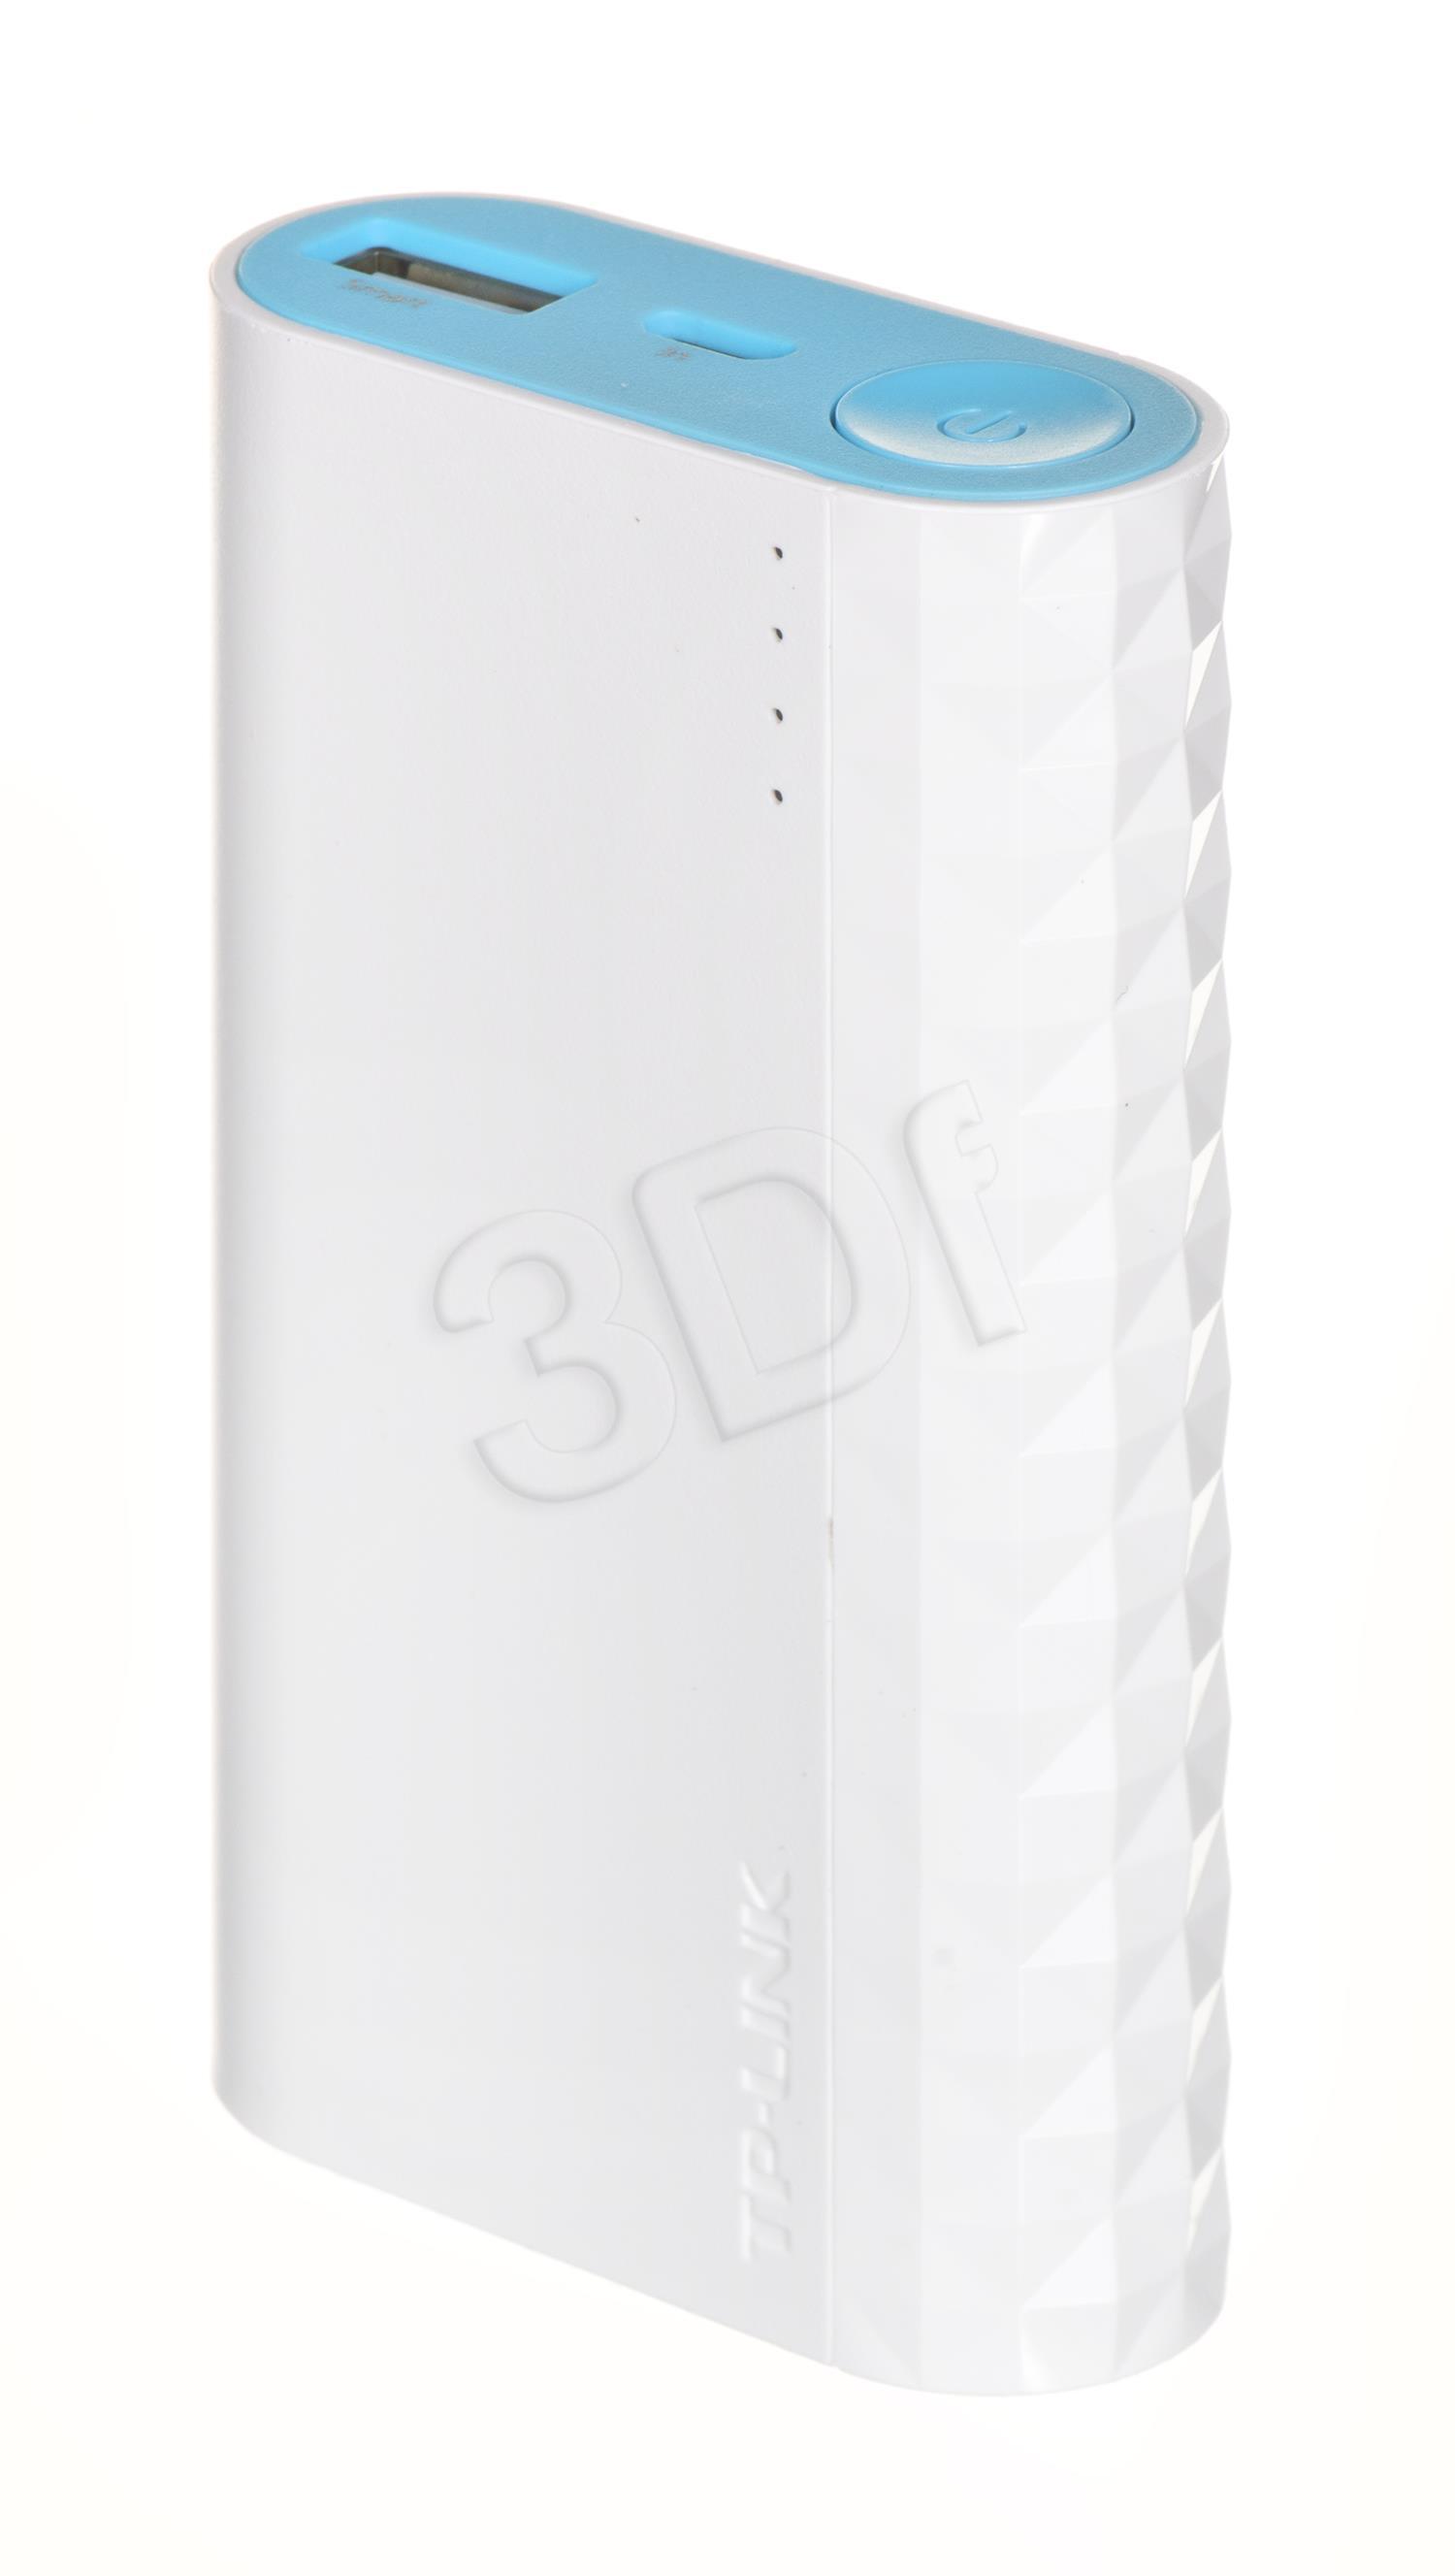 TP-Link TL-PB5200 Power Bank 5200mAh, 1 USB ports (5V/2,4A) Powerbank, mobilā uzlādes iekārta